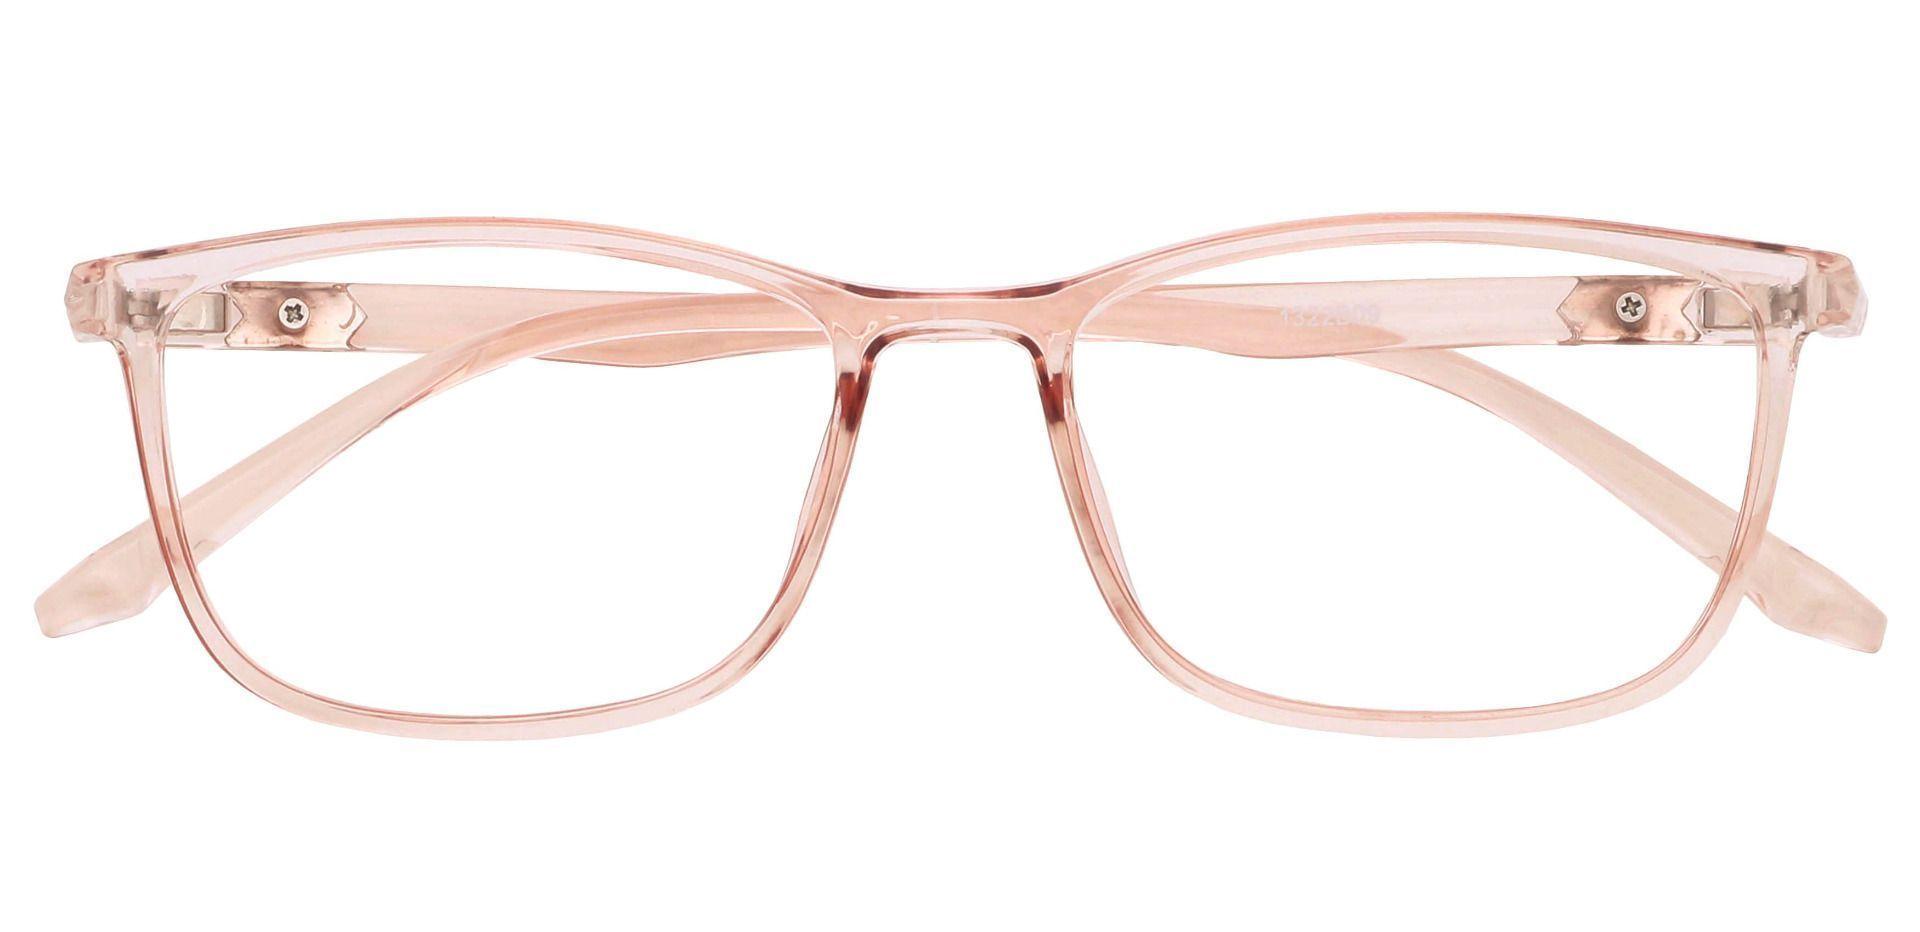 Harvest Rectangle Eyeglasses Frame - Brown